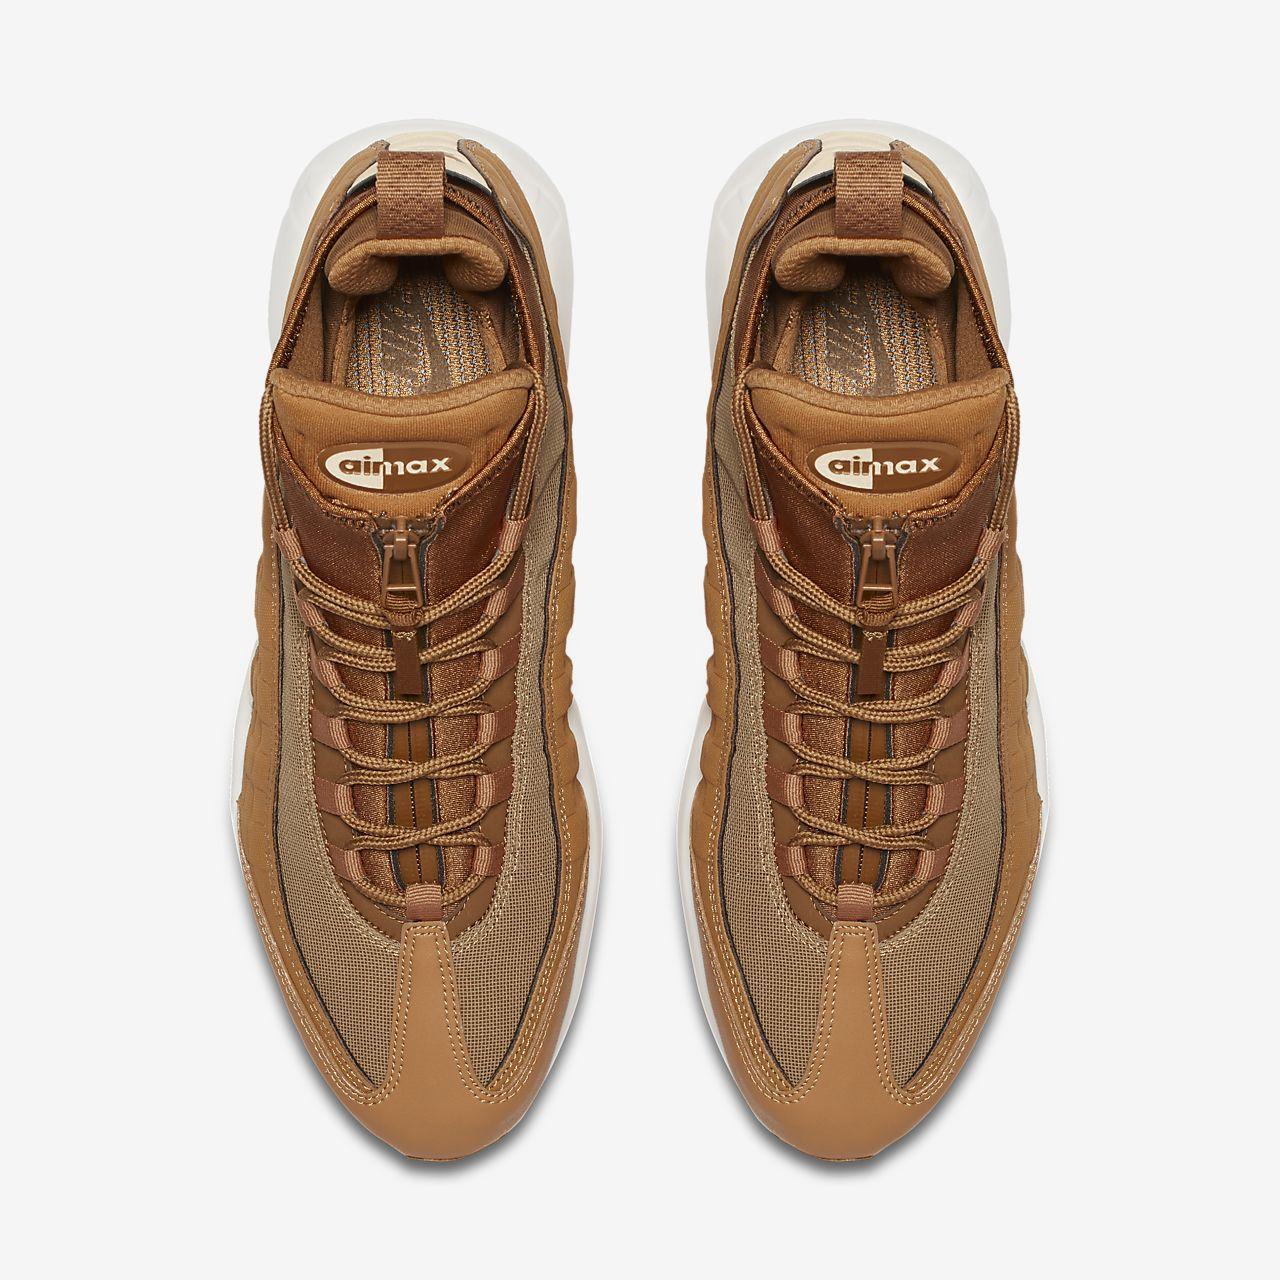 FREE SHIPPING UK 7 Nike air max 95 sneakerboot, Depop